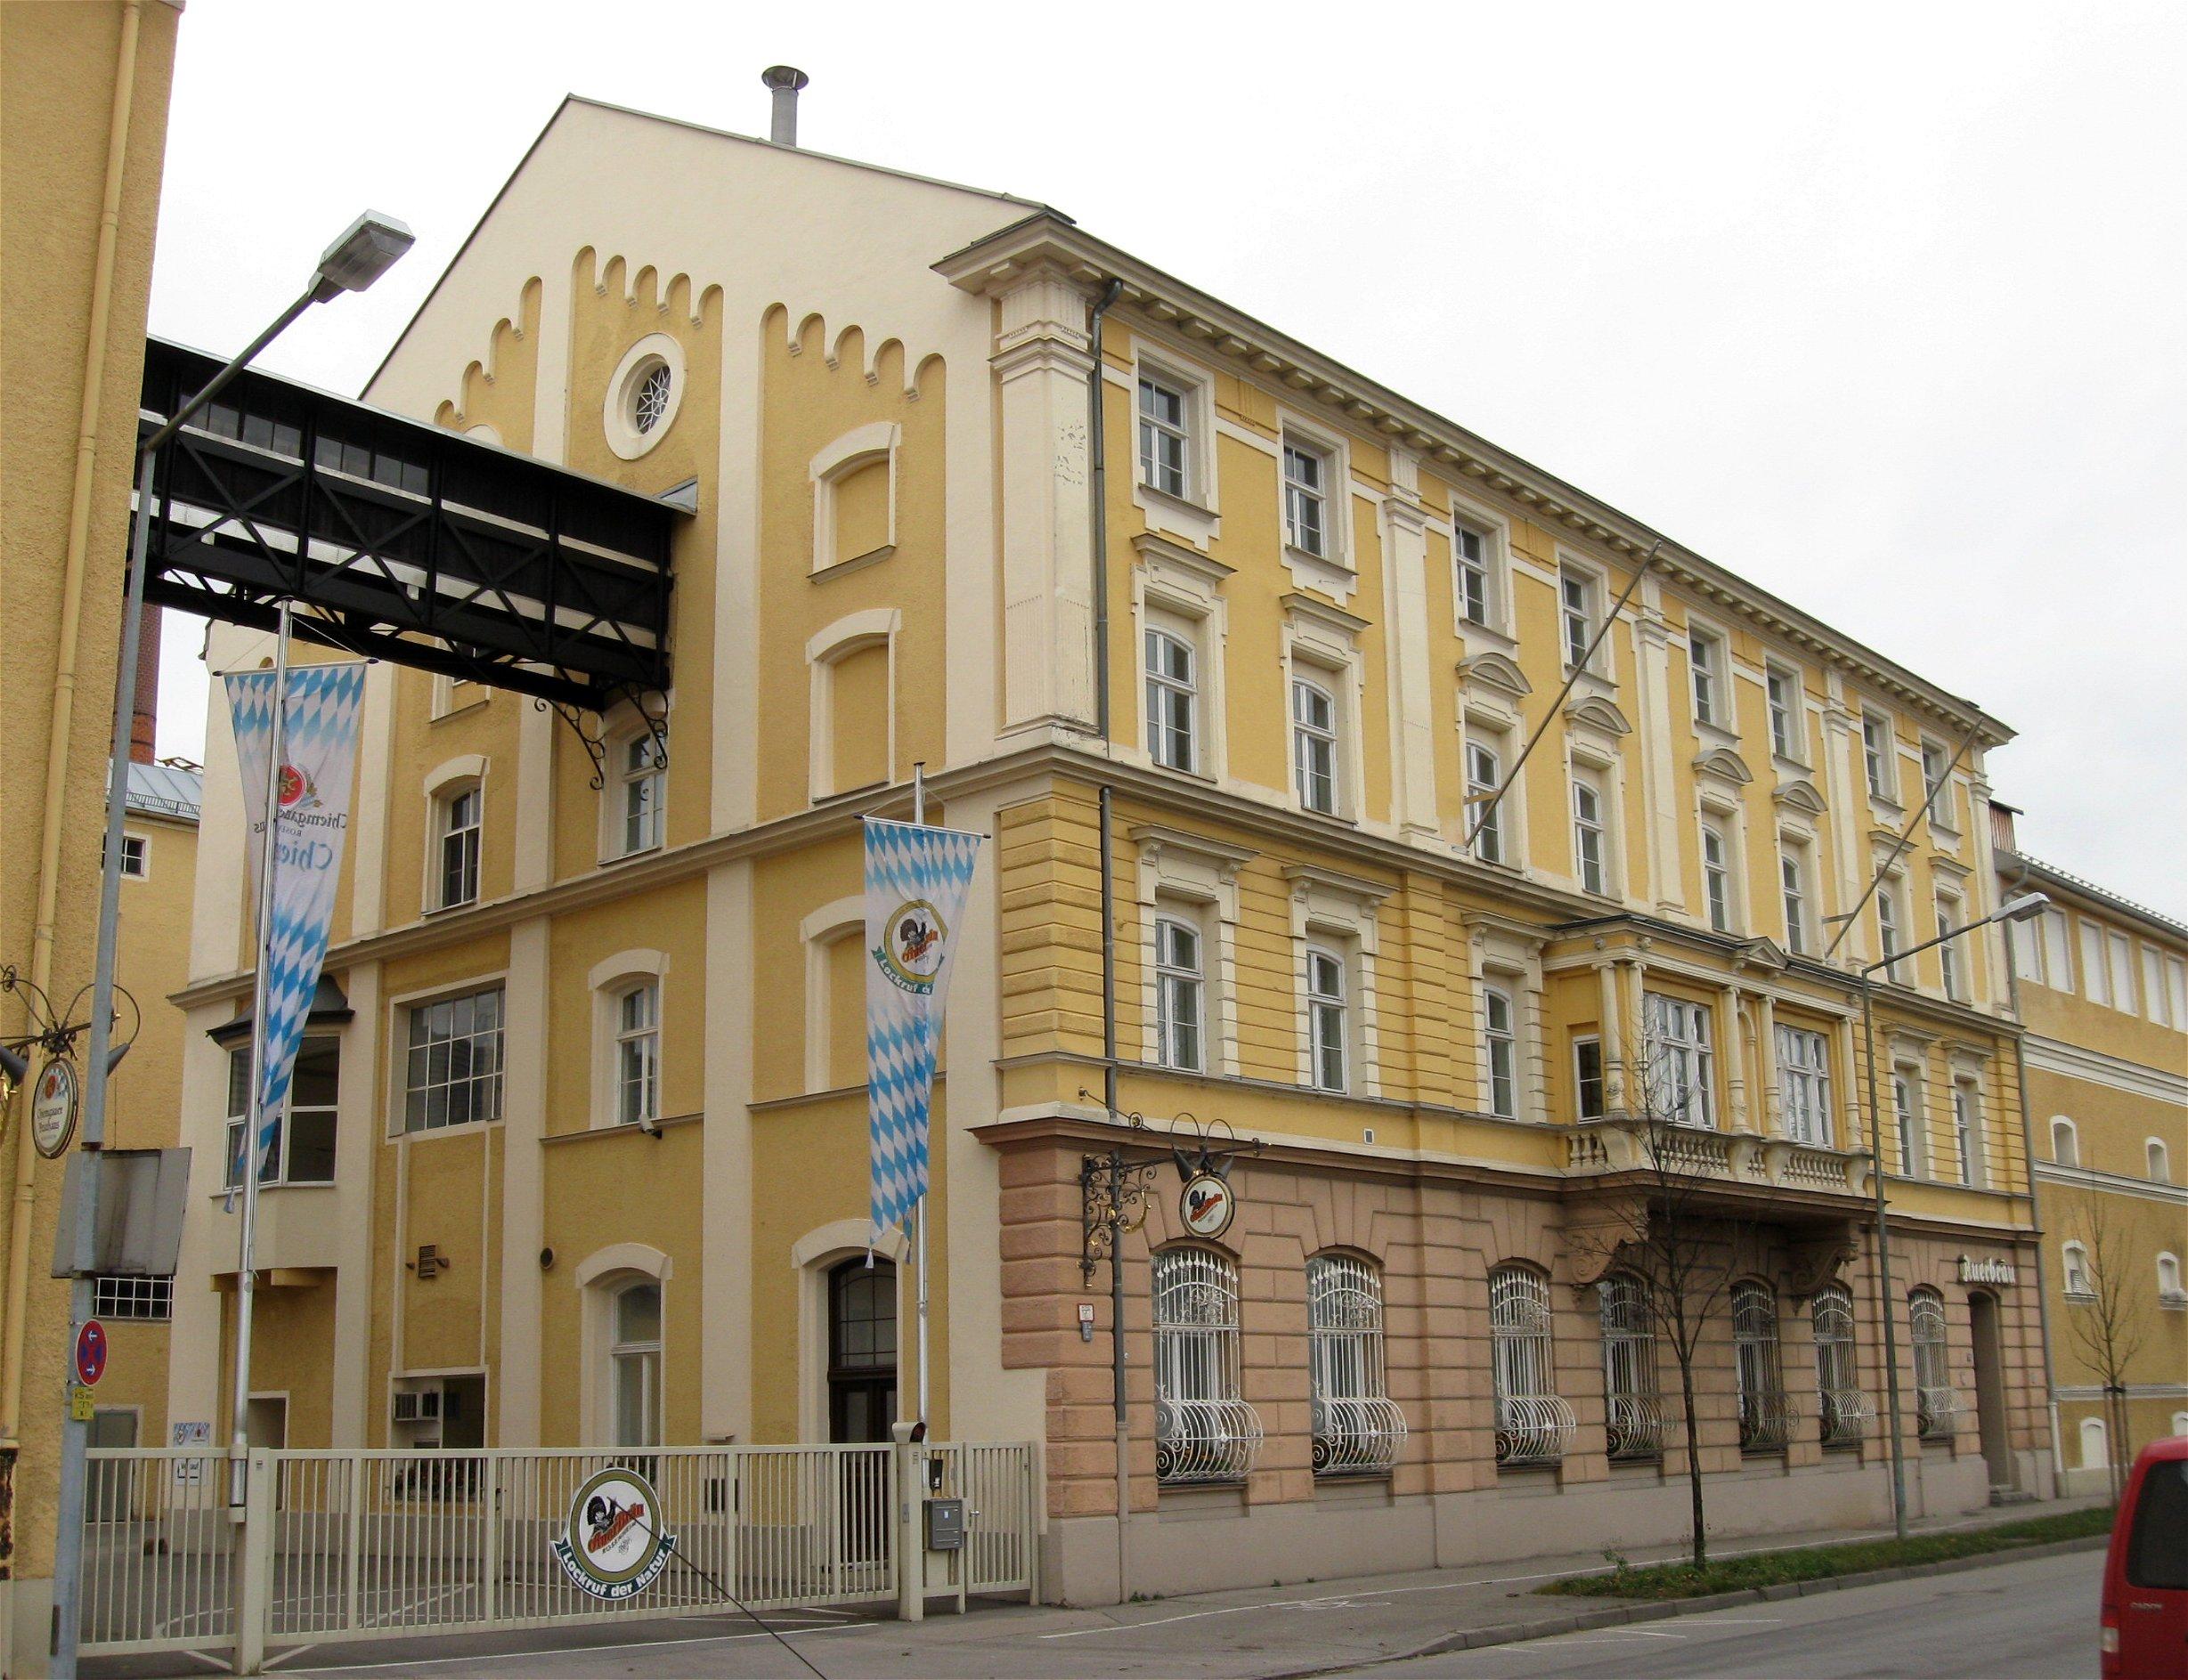 https://upload.wikimedia.org/wikipedia/commons/6/6b/Muenchener_Str._80-82_Auerbraeu_Rosenheim-1.jpg